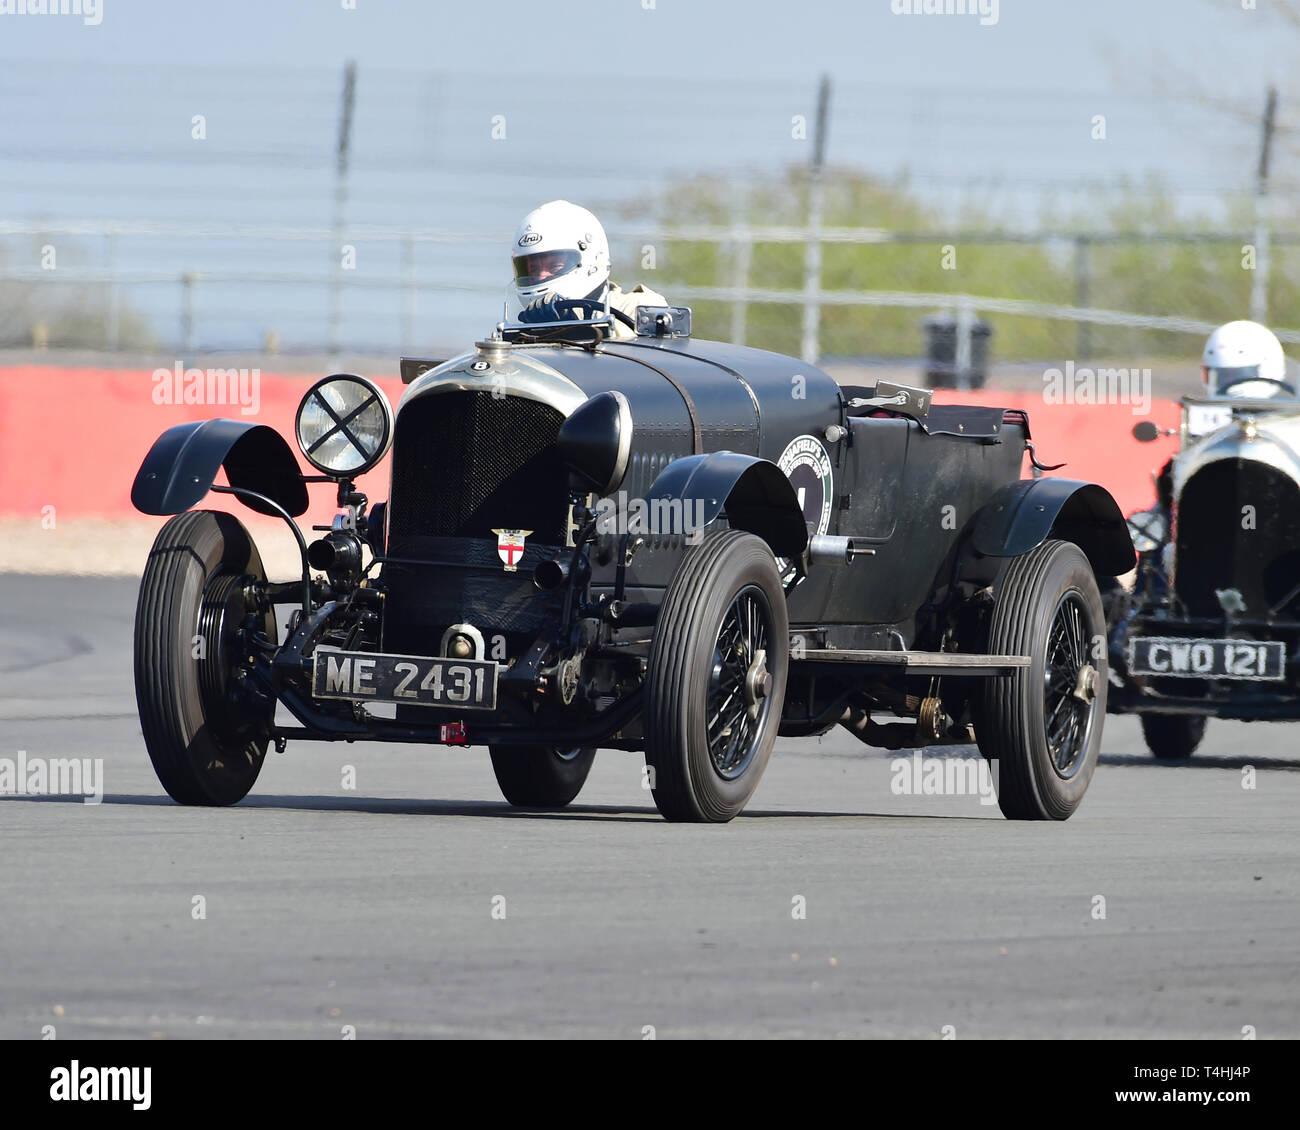 Jonathan Turner, William Metcalf, Bentley 3 litre, Benjafield 100, 100 Years of Bentley, April 2019,  Silverstone, Northamptonshire, England, circuit  - Stock Image